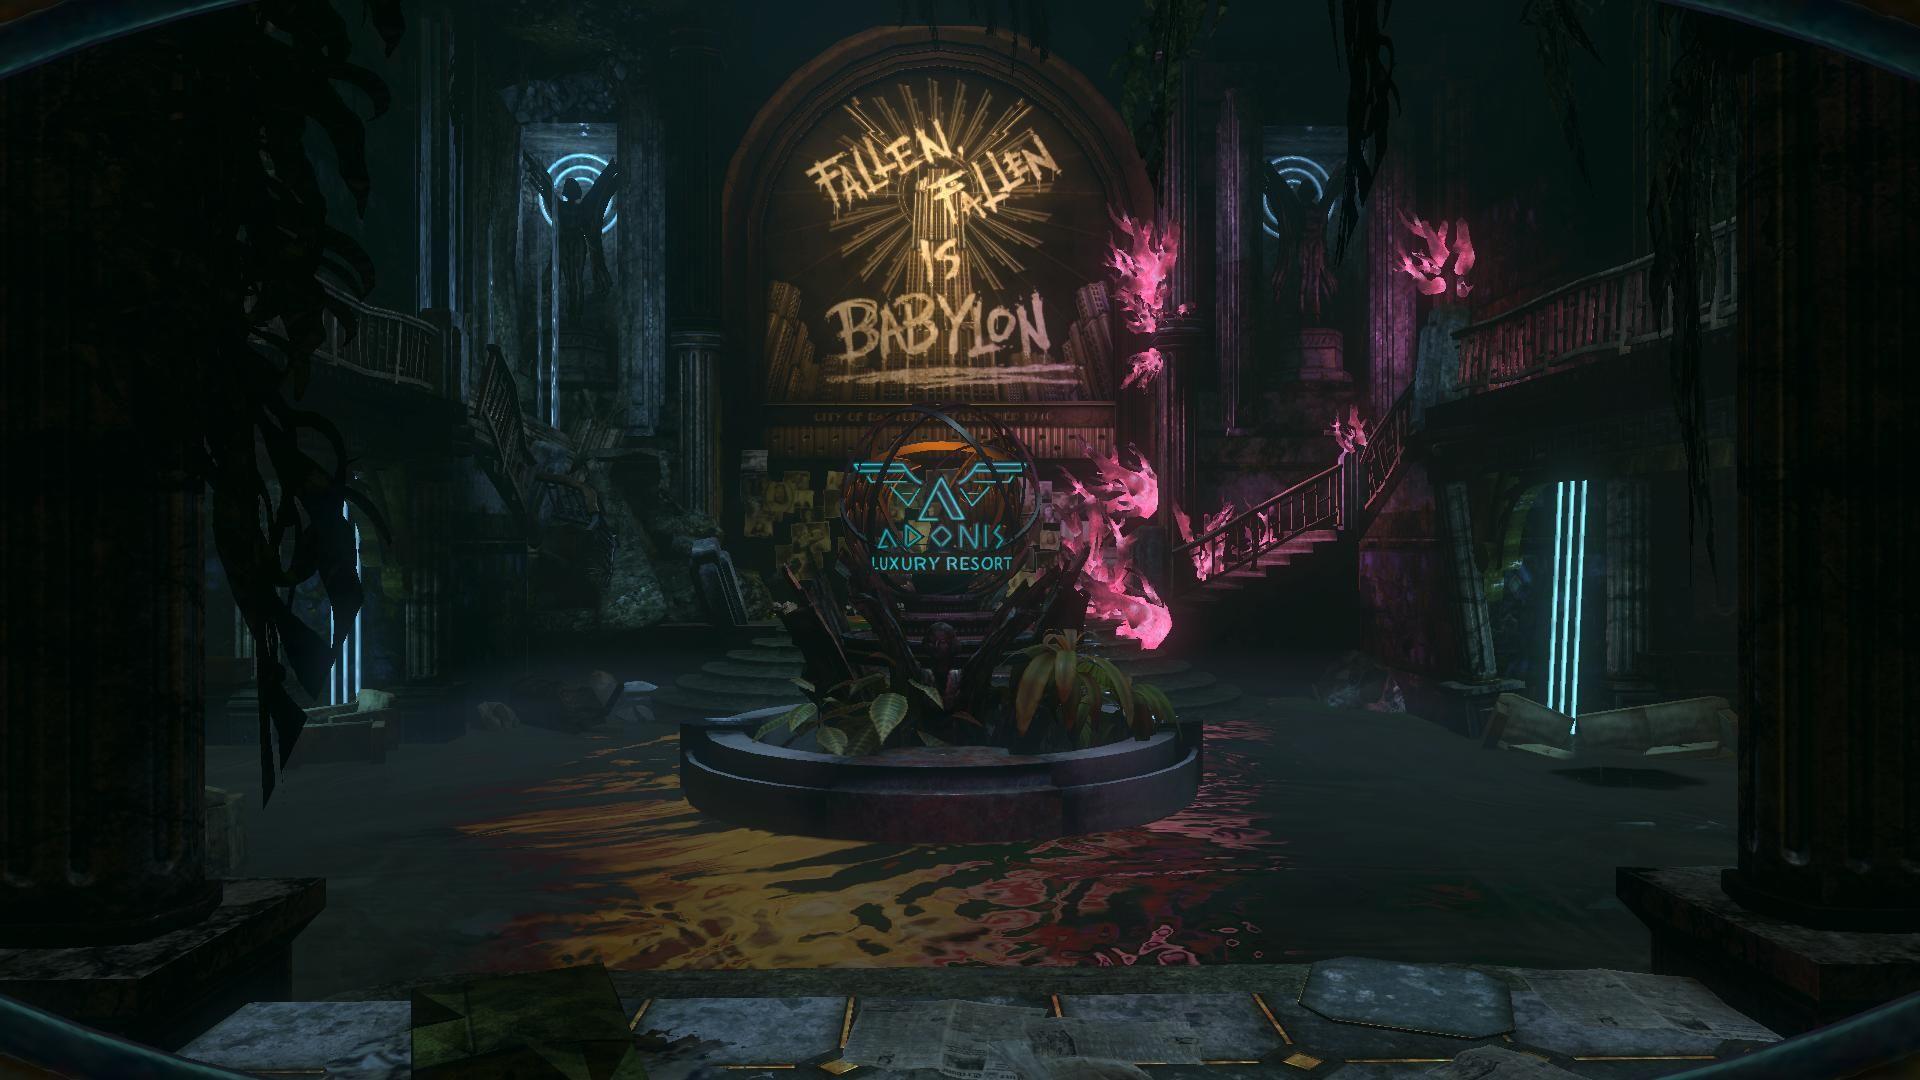 Video Games BioShock Rapture Fresh HD Wallpaper Bioshock 2 Infinite